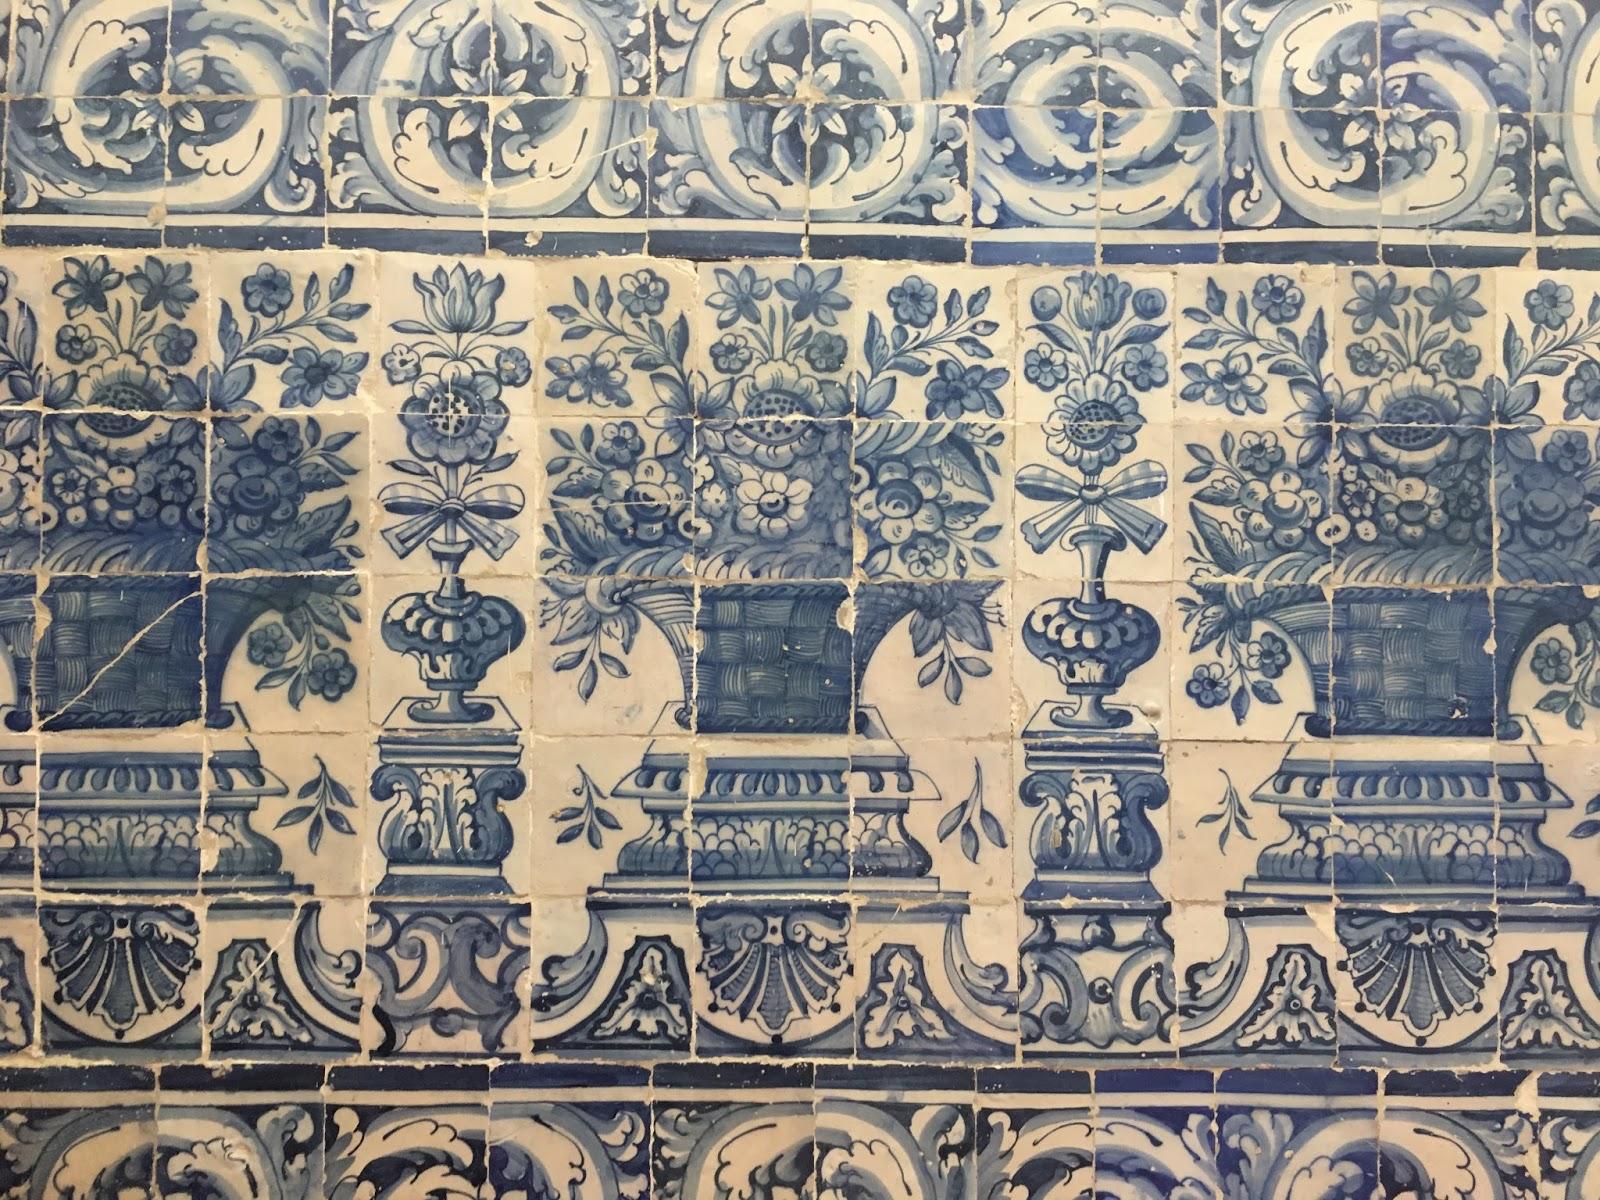 oeiras, Portugal, Lisbon, Palácie Marques de Pombal, azulejos